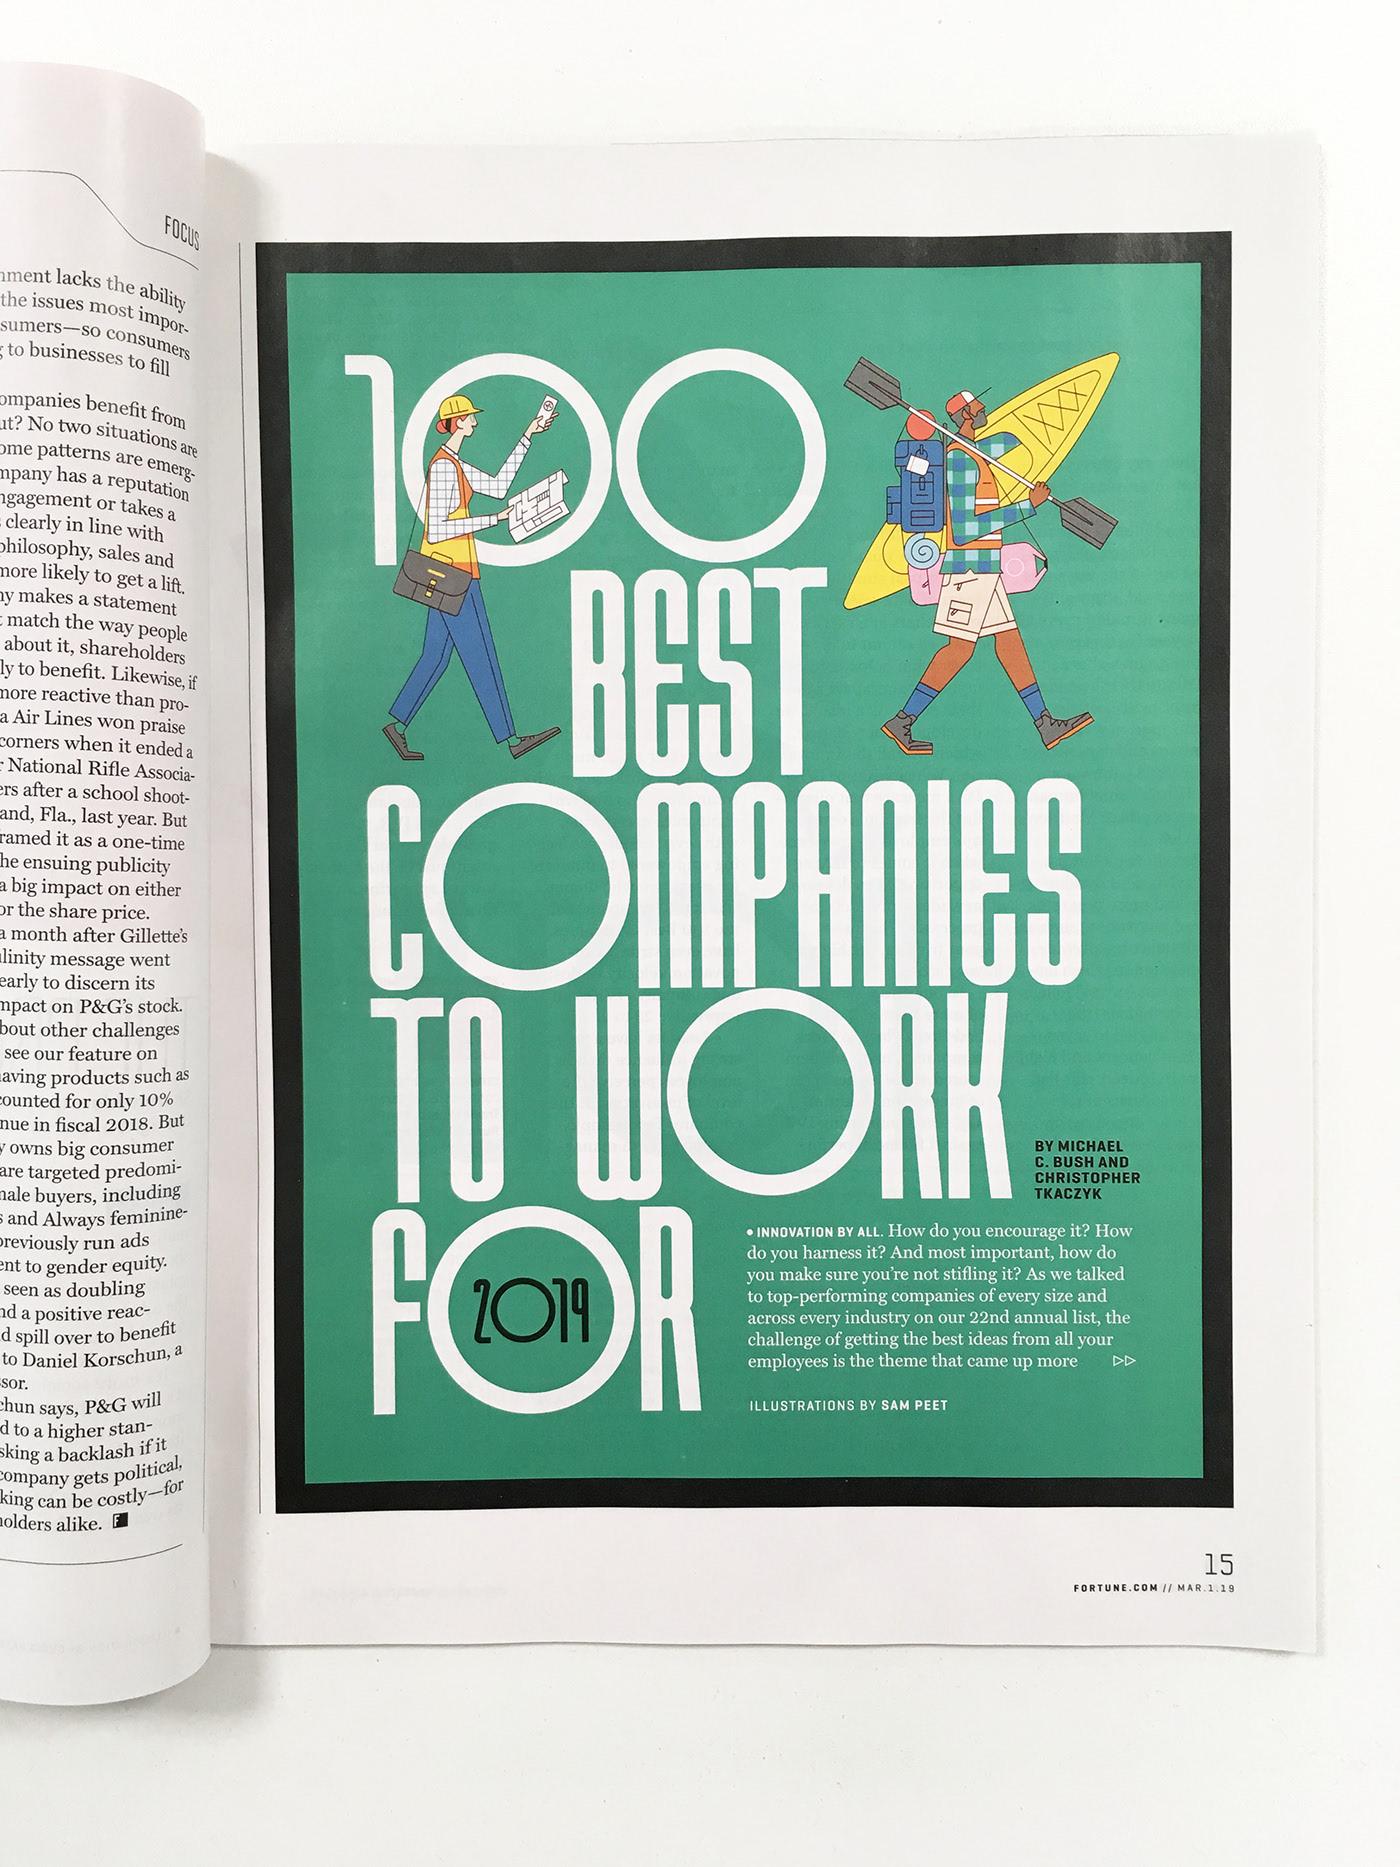 Fortune Magazine Illustrations by Sam Peet